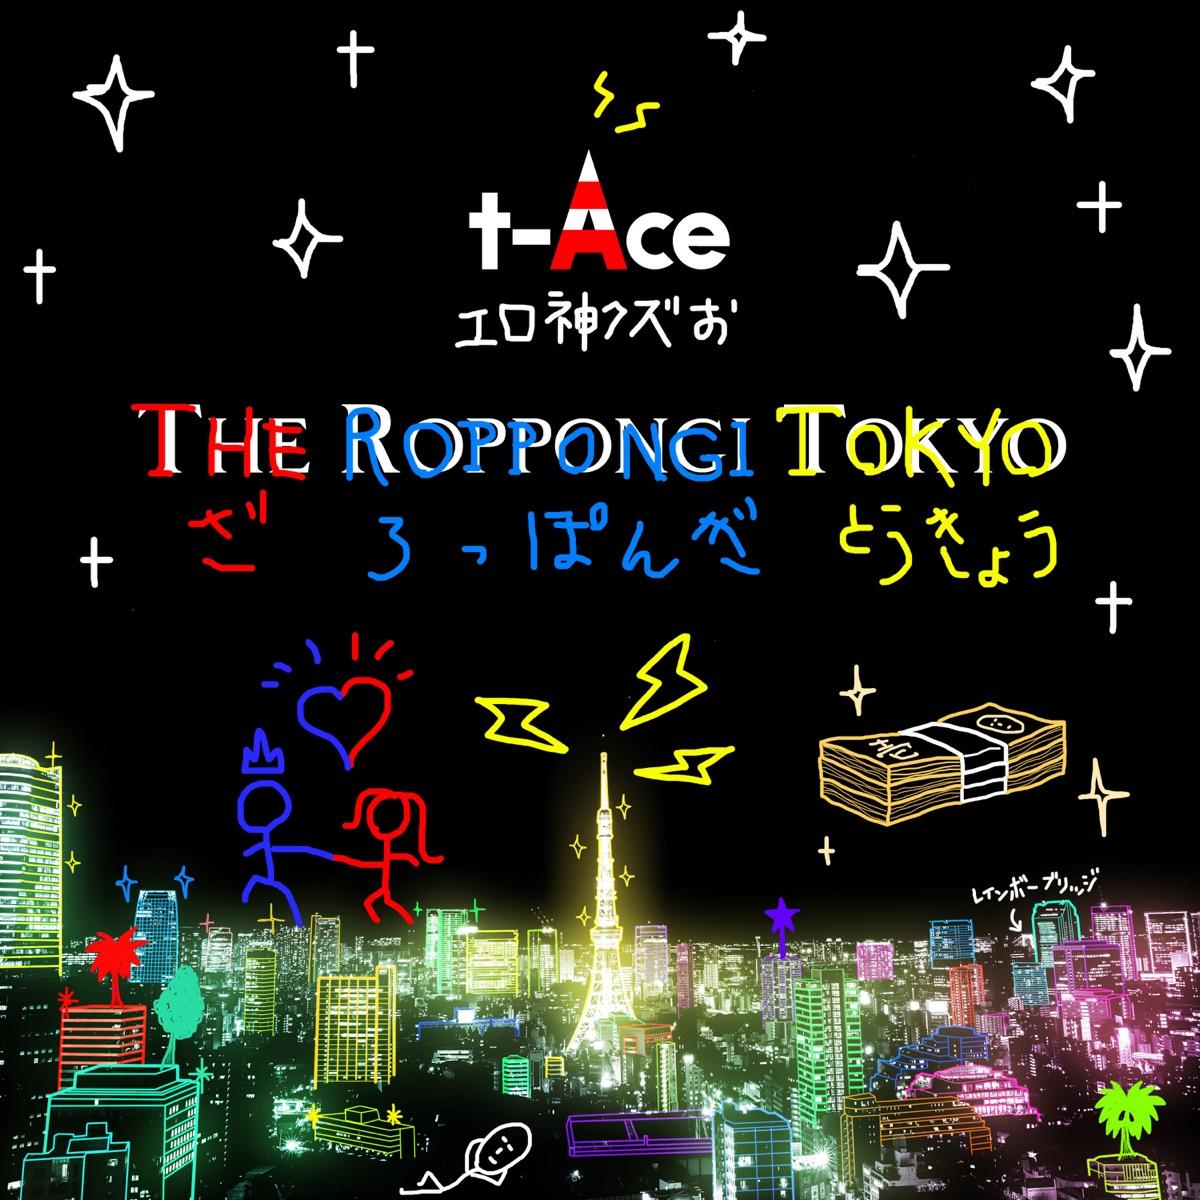 『t-AceThe Roppongi Tokyo』収録の『The Roppongi Tokyo』ジャケット